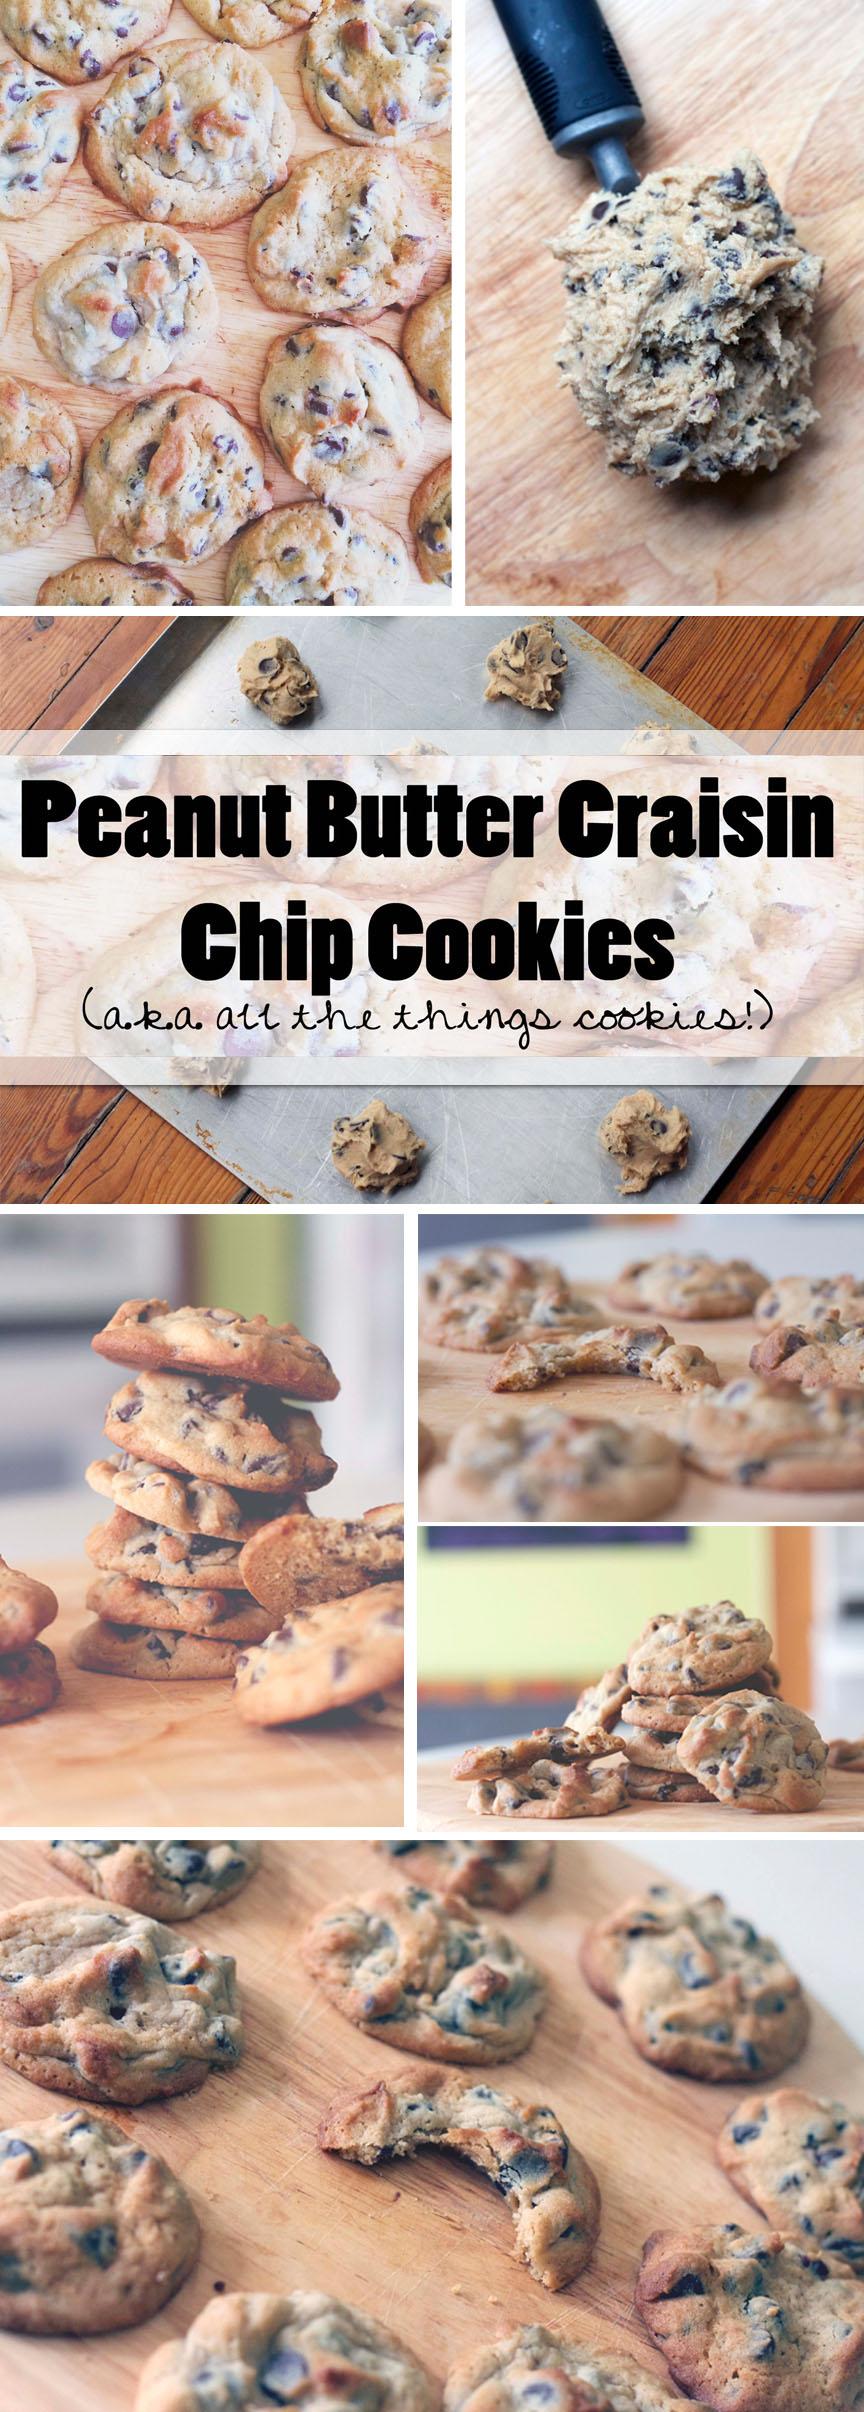 Peanut Butter Chip Craisin Cookies Pintierest